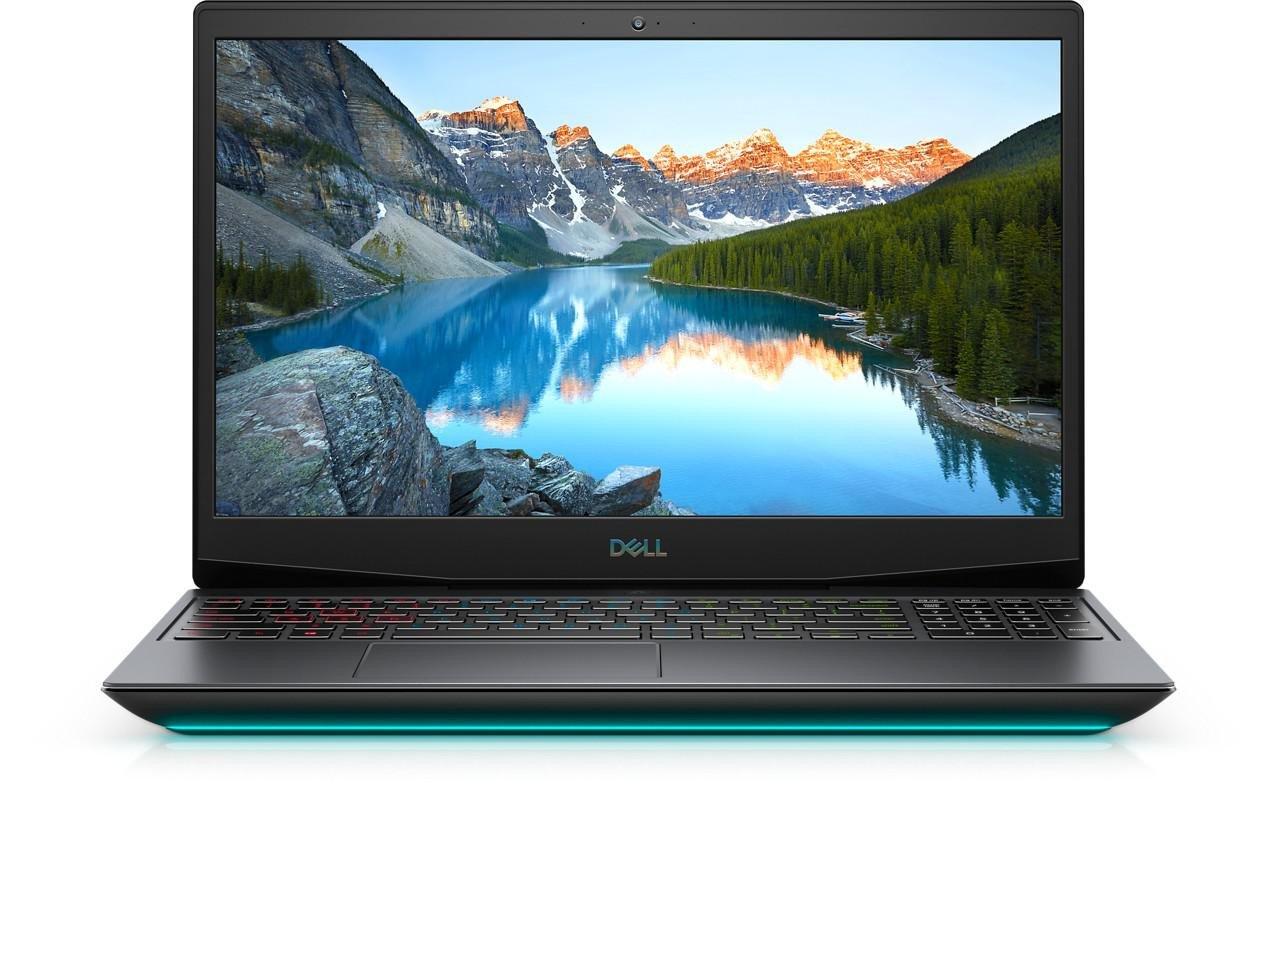 "Laptop Dell Inspiron Gaming 5500 G5, 15.6"" FHD, i7-10750H, 16GB, 1TB SSD, GeForce RTX 2070, Ubuntu - imaginea 1"